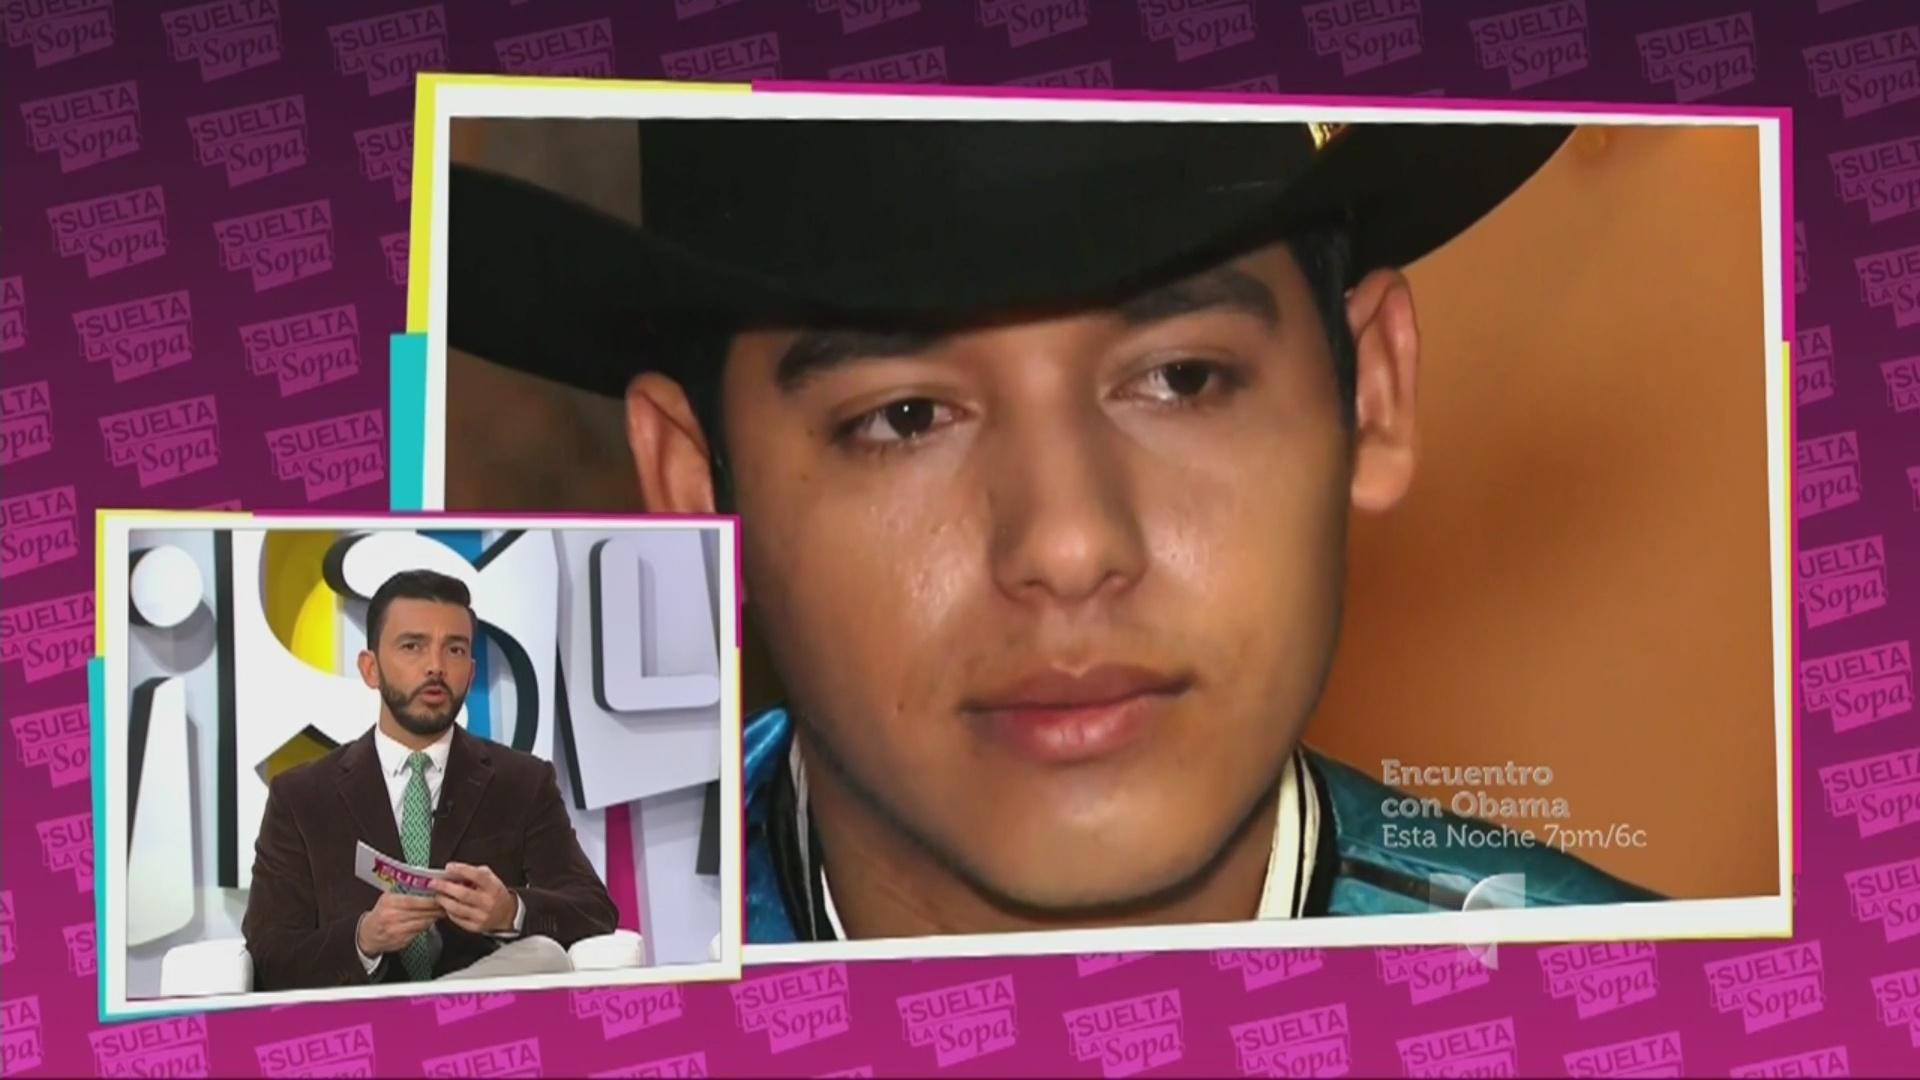 El cantante Ariel Camacho muri243 en un accidente  : 1502252849526ElcantanteArielCamachomurioenunaccide from www.telemundo.com size 1920 x 1080 jpeg 347kB